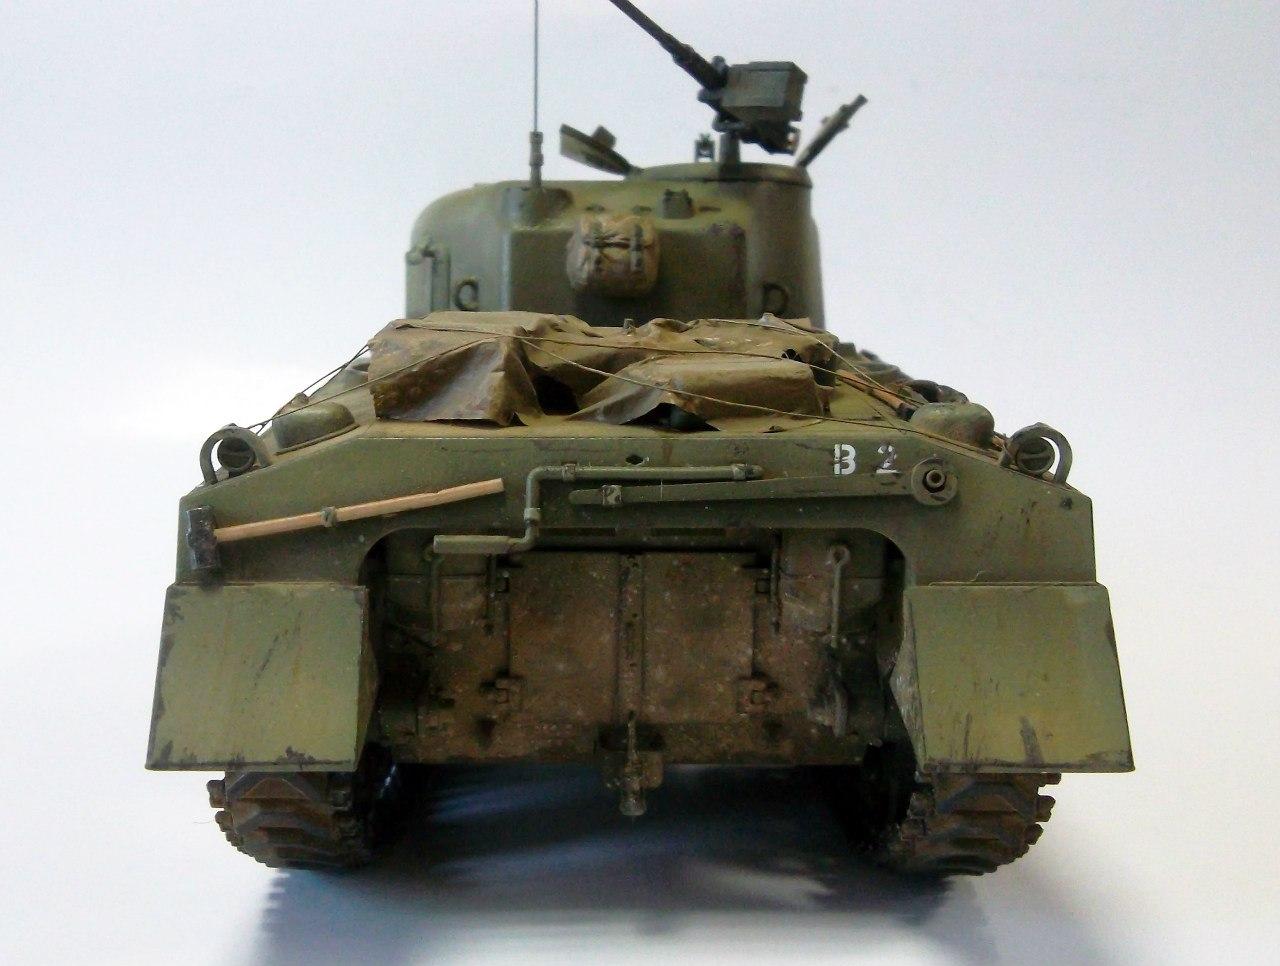 M4 Sherman (Tamiya 35190 1/35) 0oCk1nb8VII